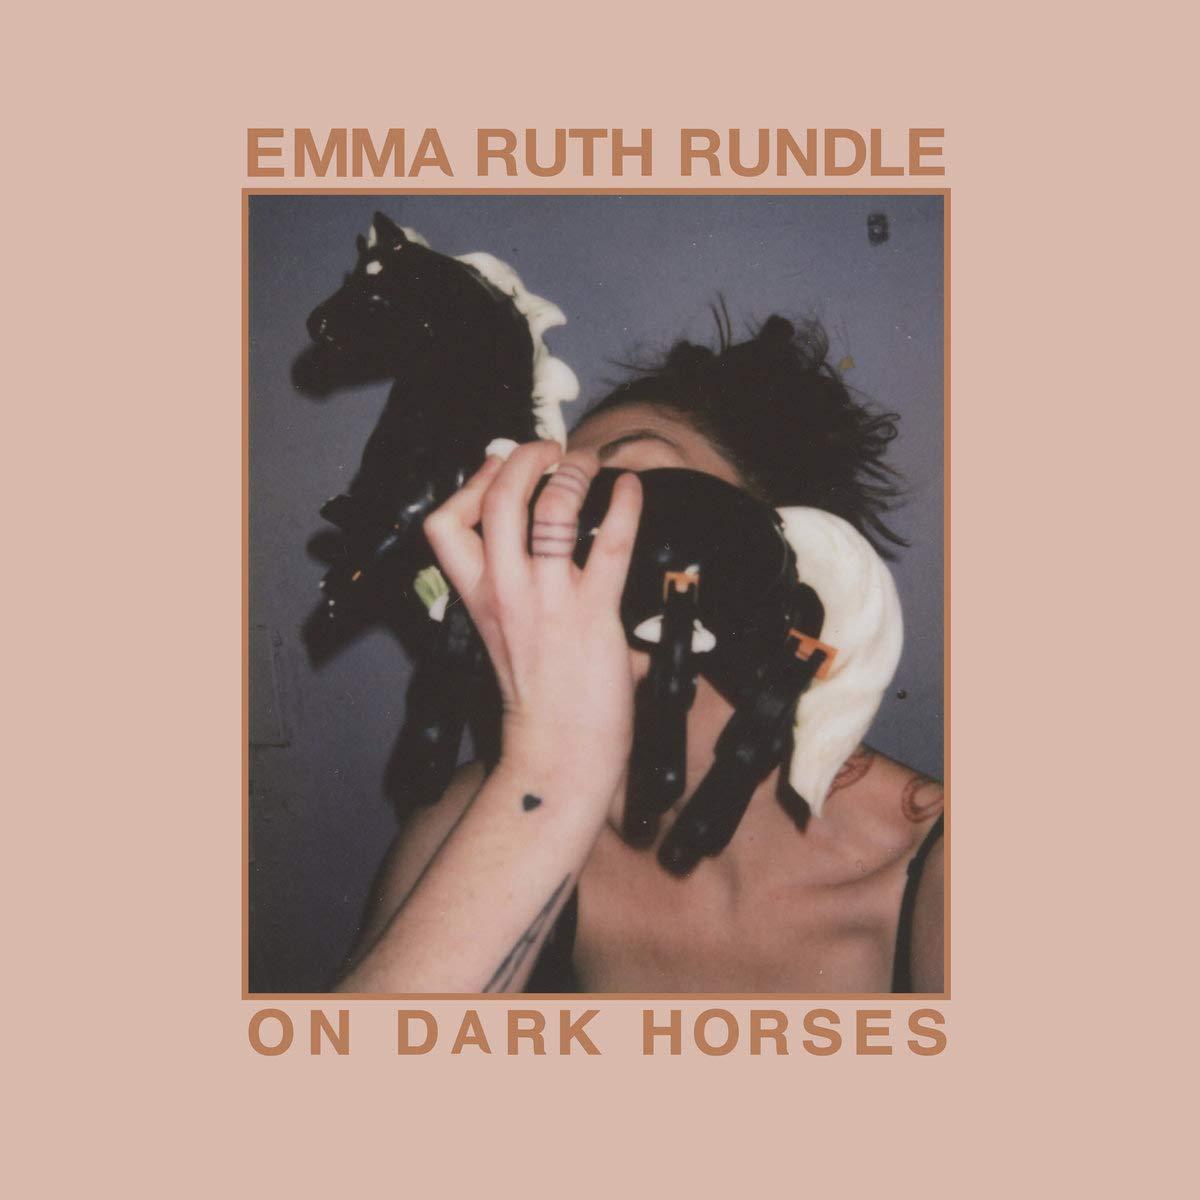 Emma Ruth Rundle - On Dark Horses (2018)